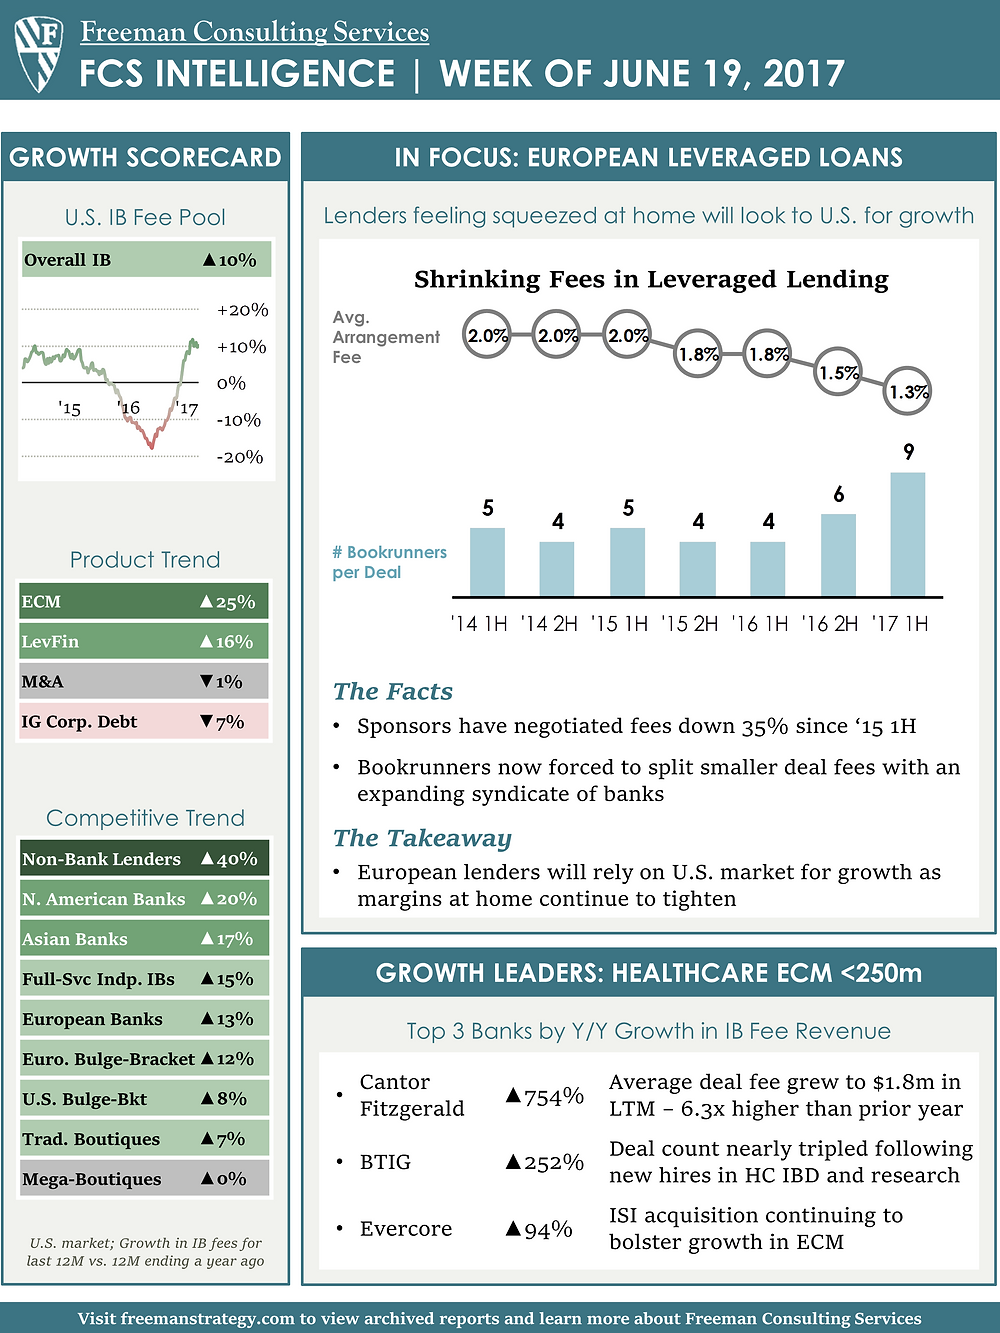 European Leveraged Loans